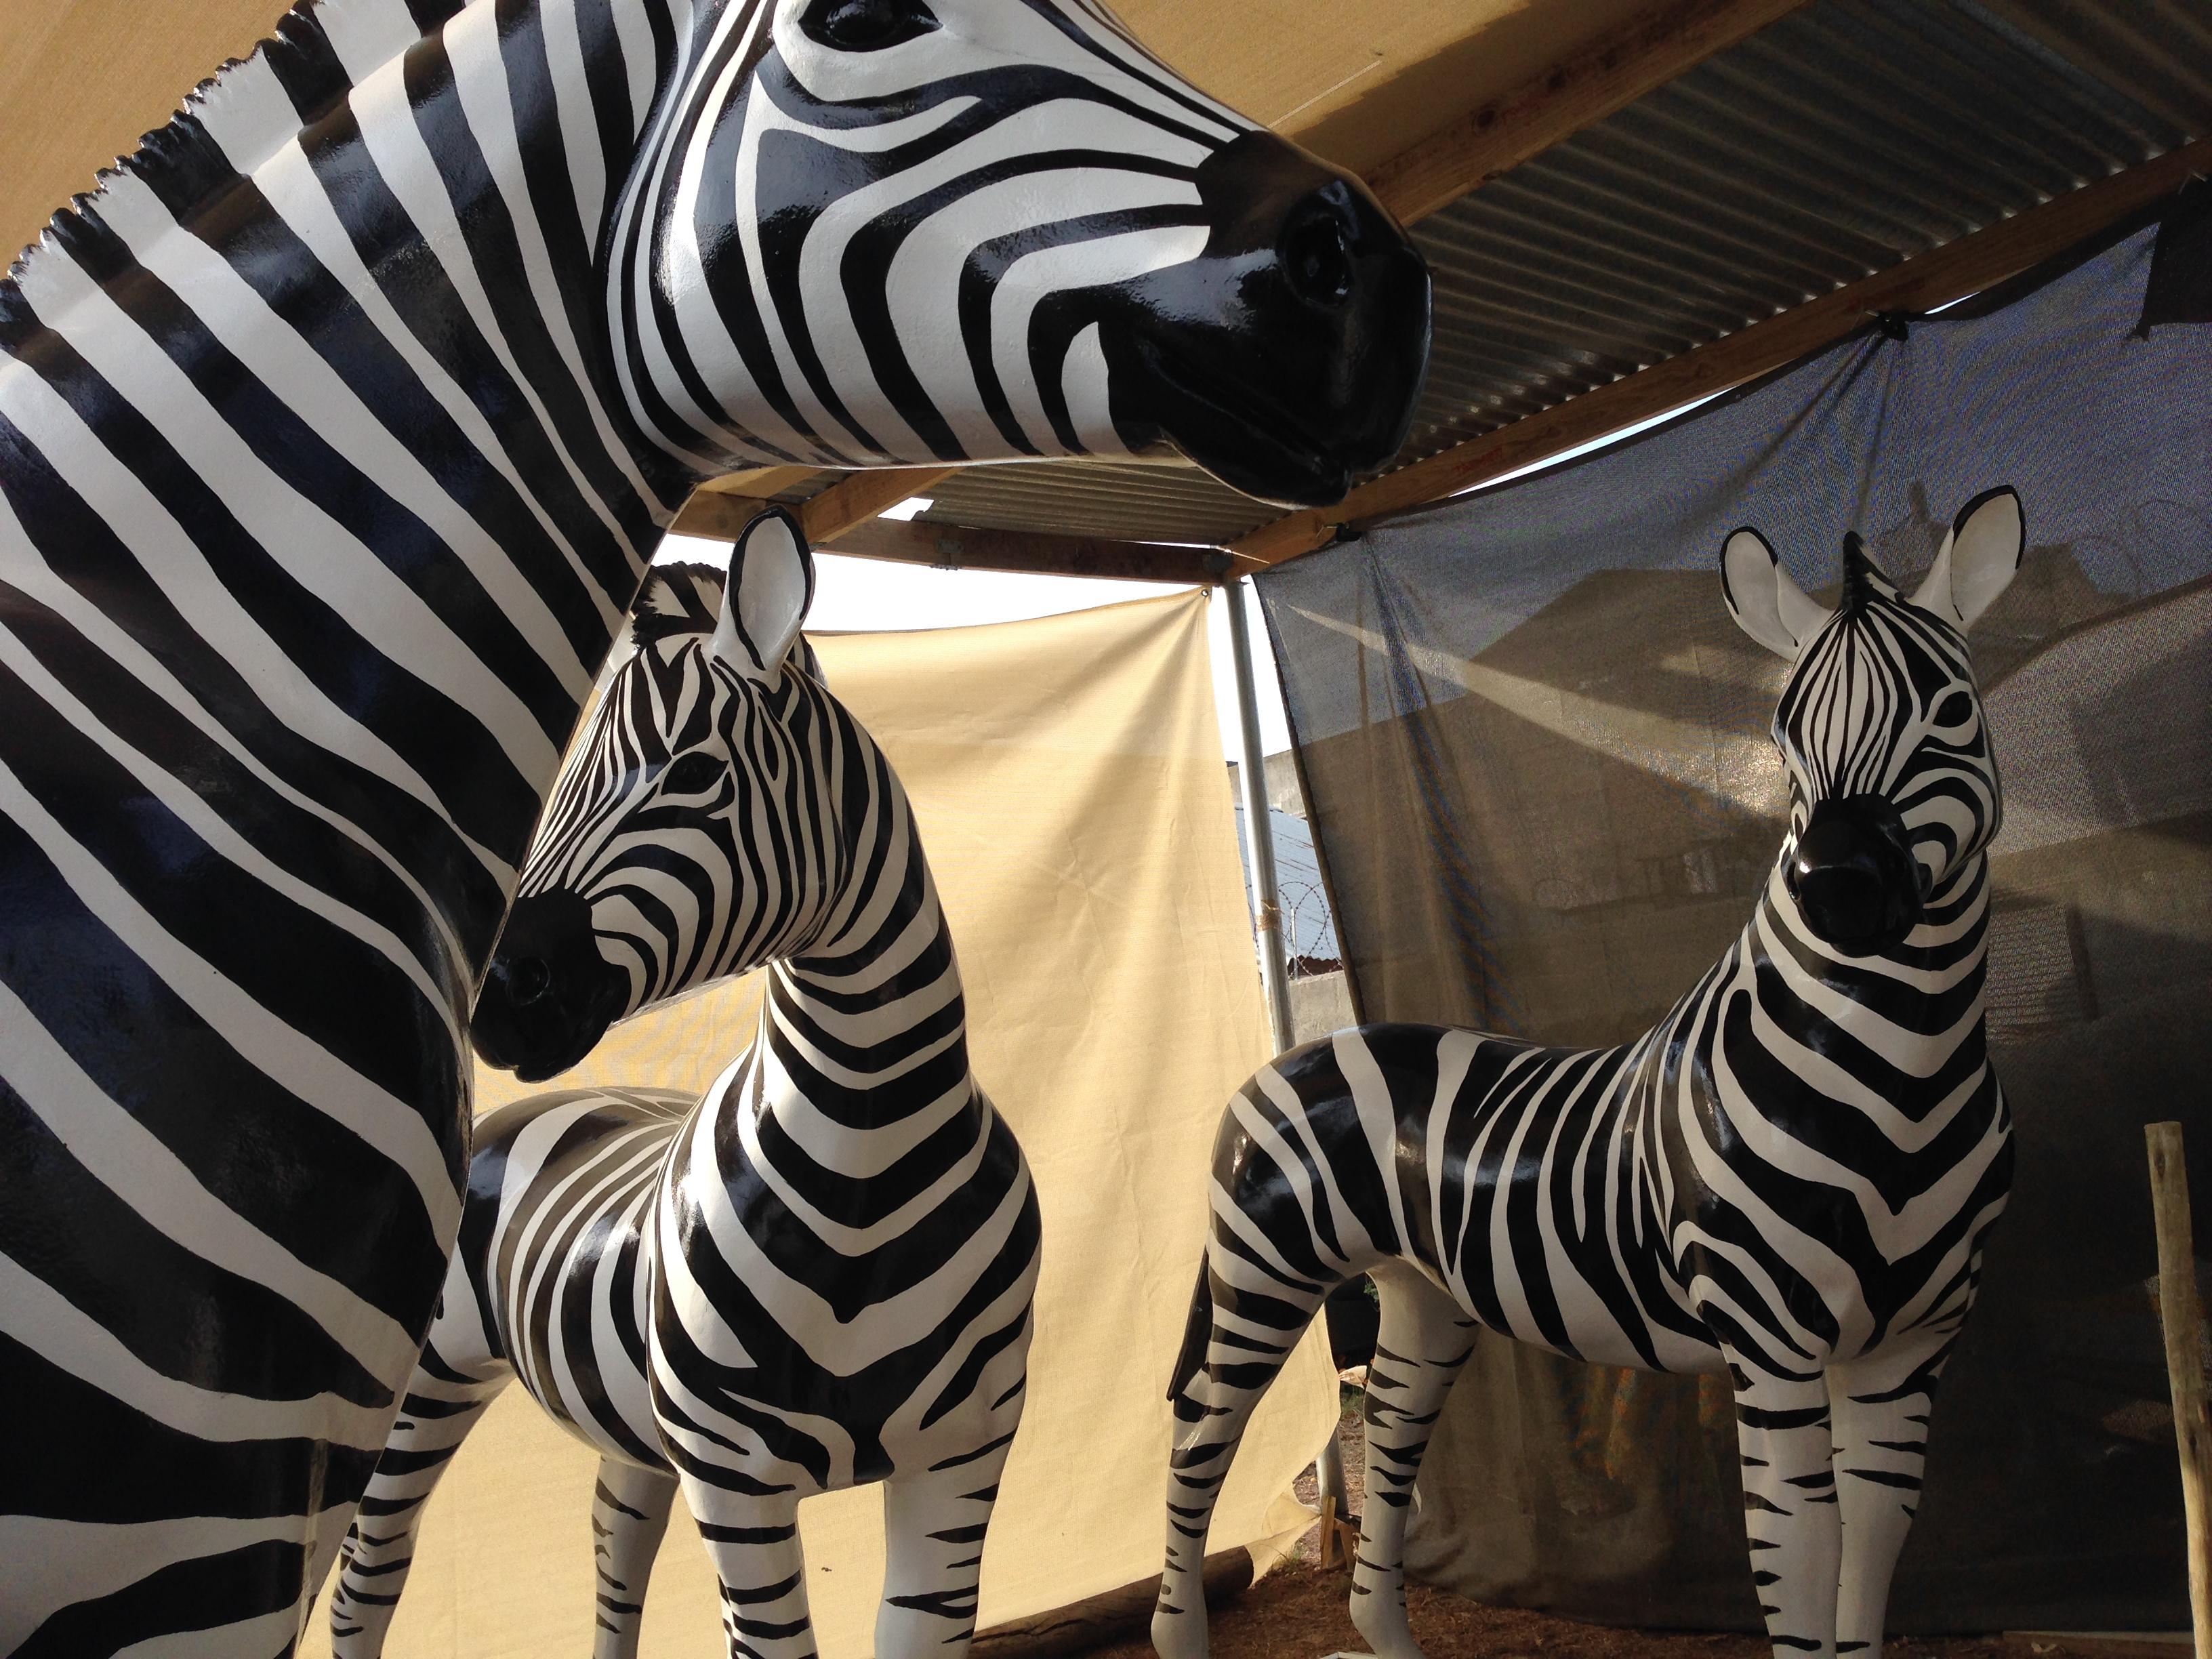 life size fabricated zebras